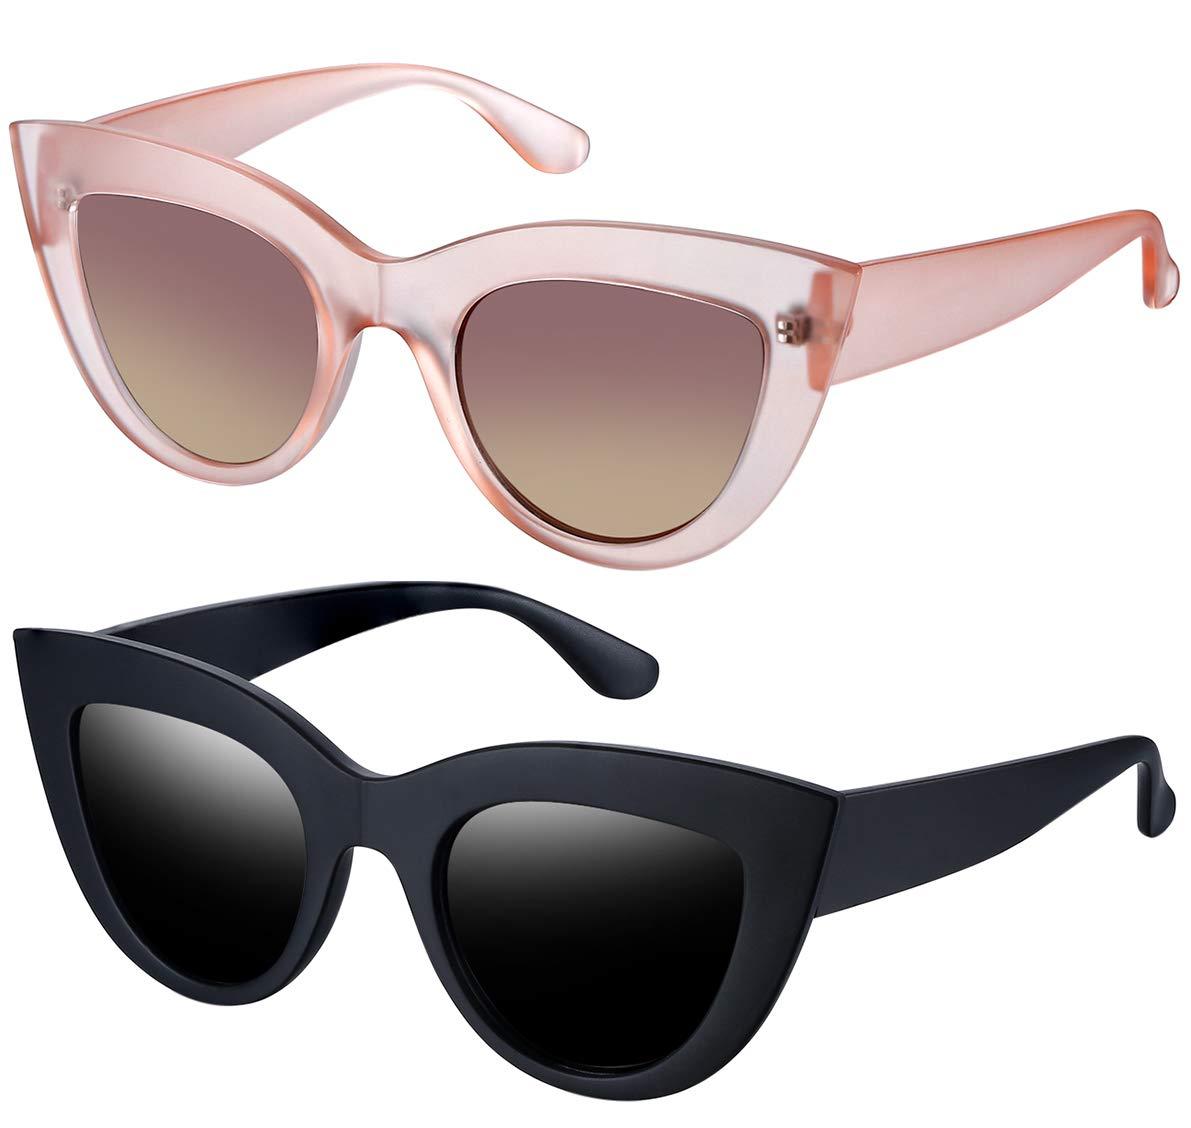 Joopin Retro Polarized Cateye Sunglasses - Women Vintage Cat Eye Sun Glasses UV400 Protection E8022 (Matte Black+Pink Tea) by Joopin